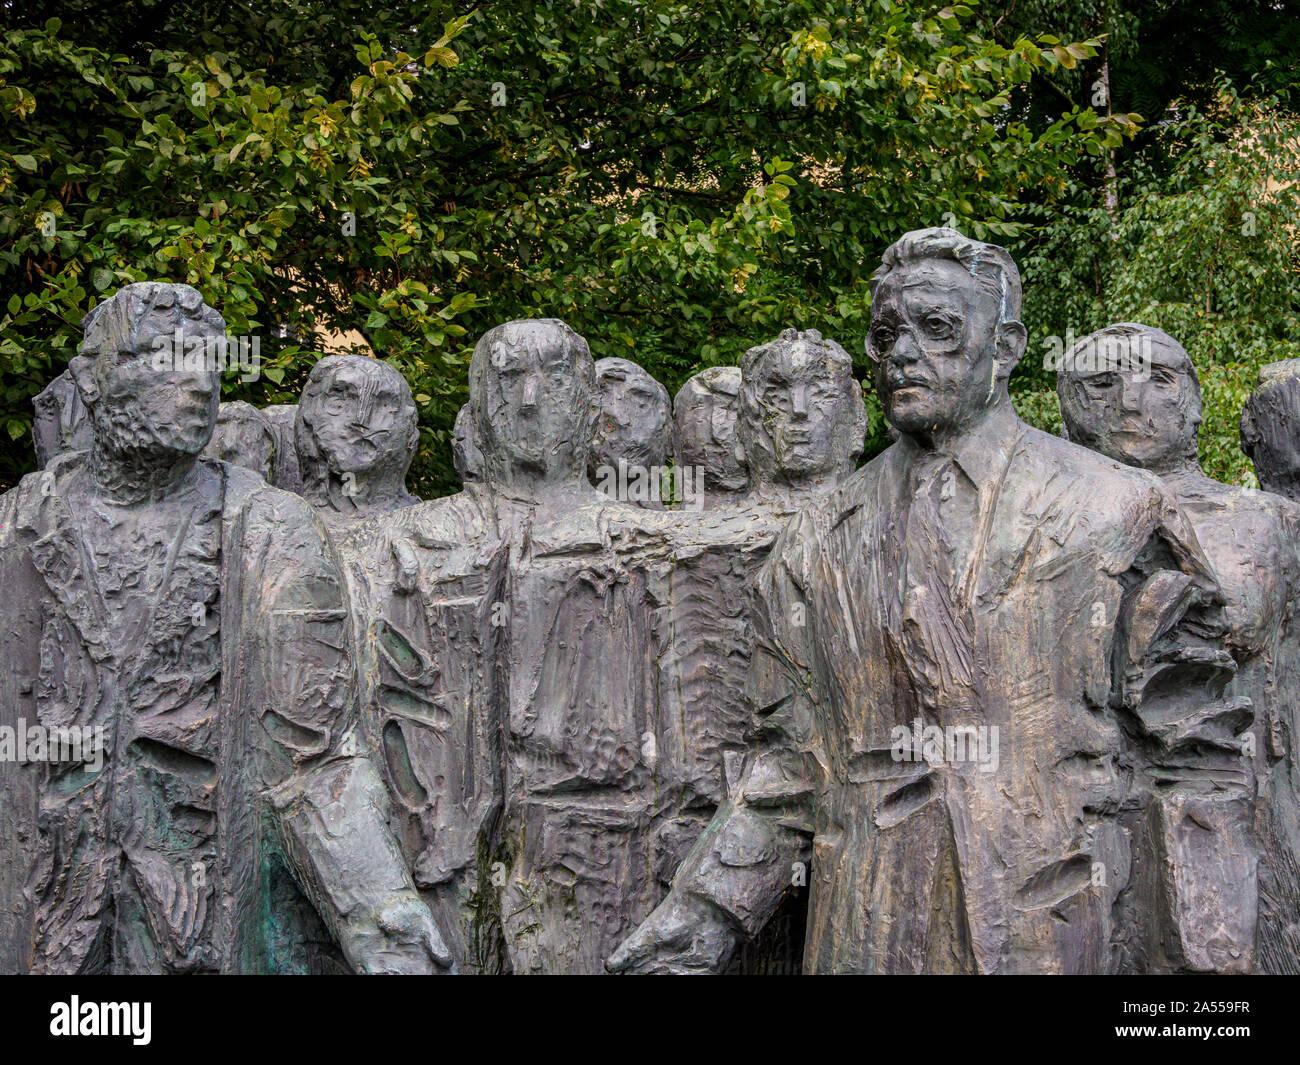 Spomenik Edvardu Kardelju Stock Photos Spomenik Edvardu Kardelju